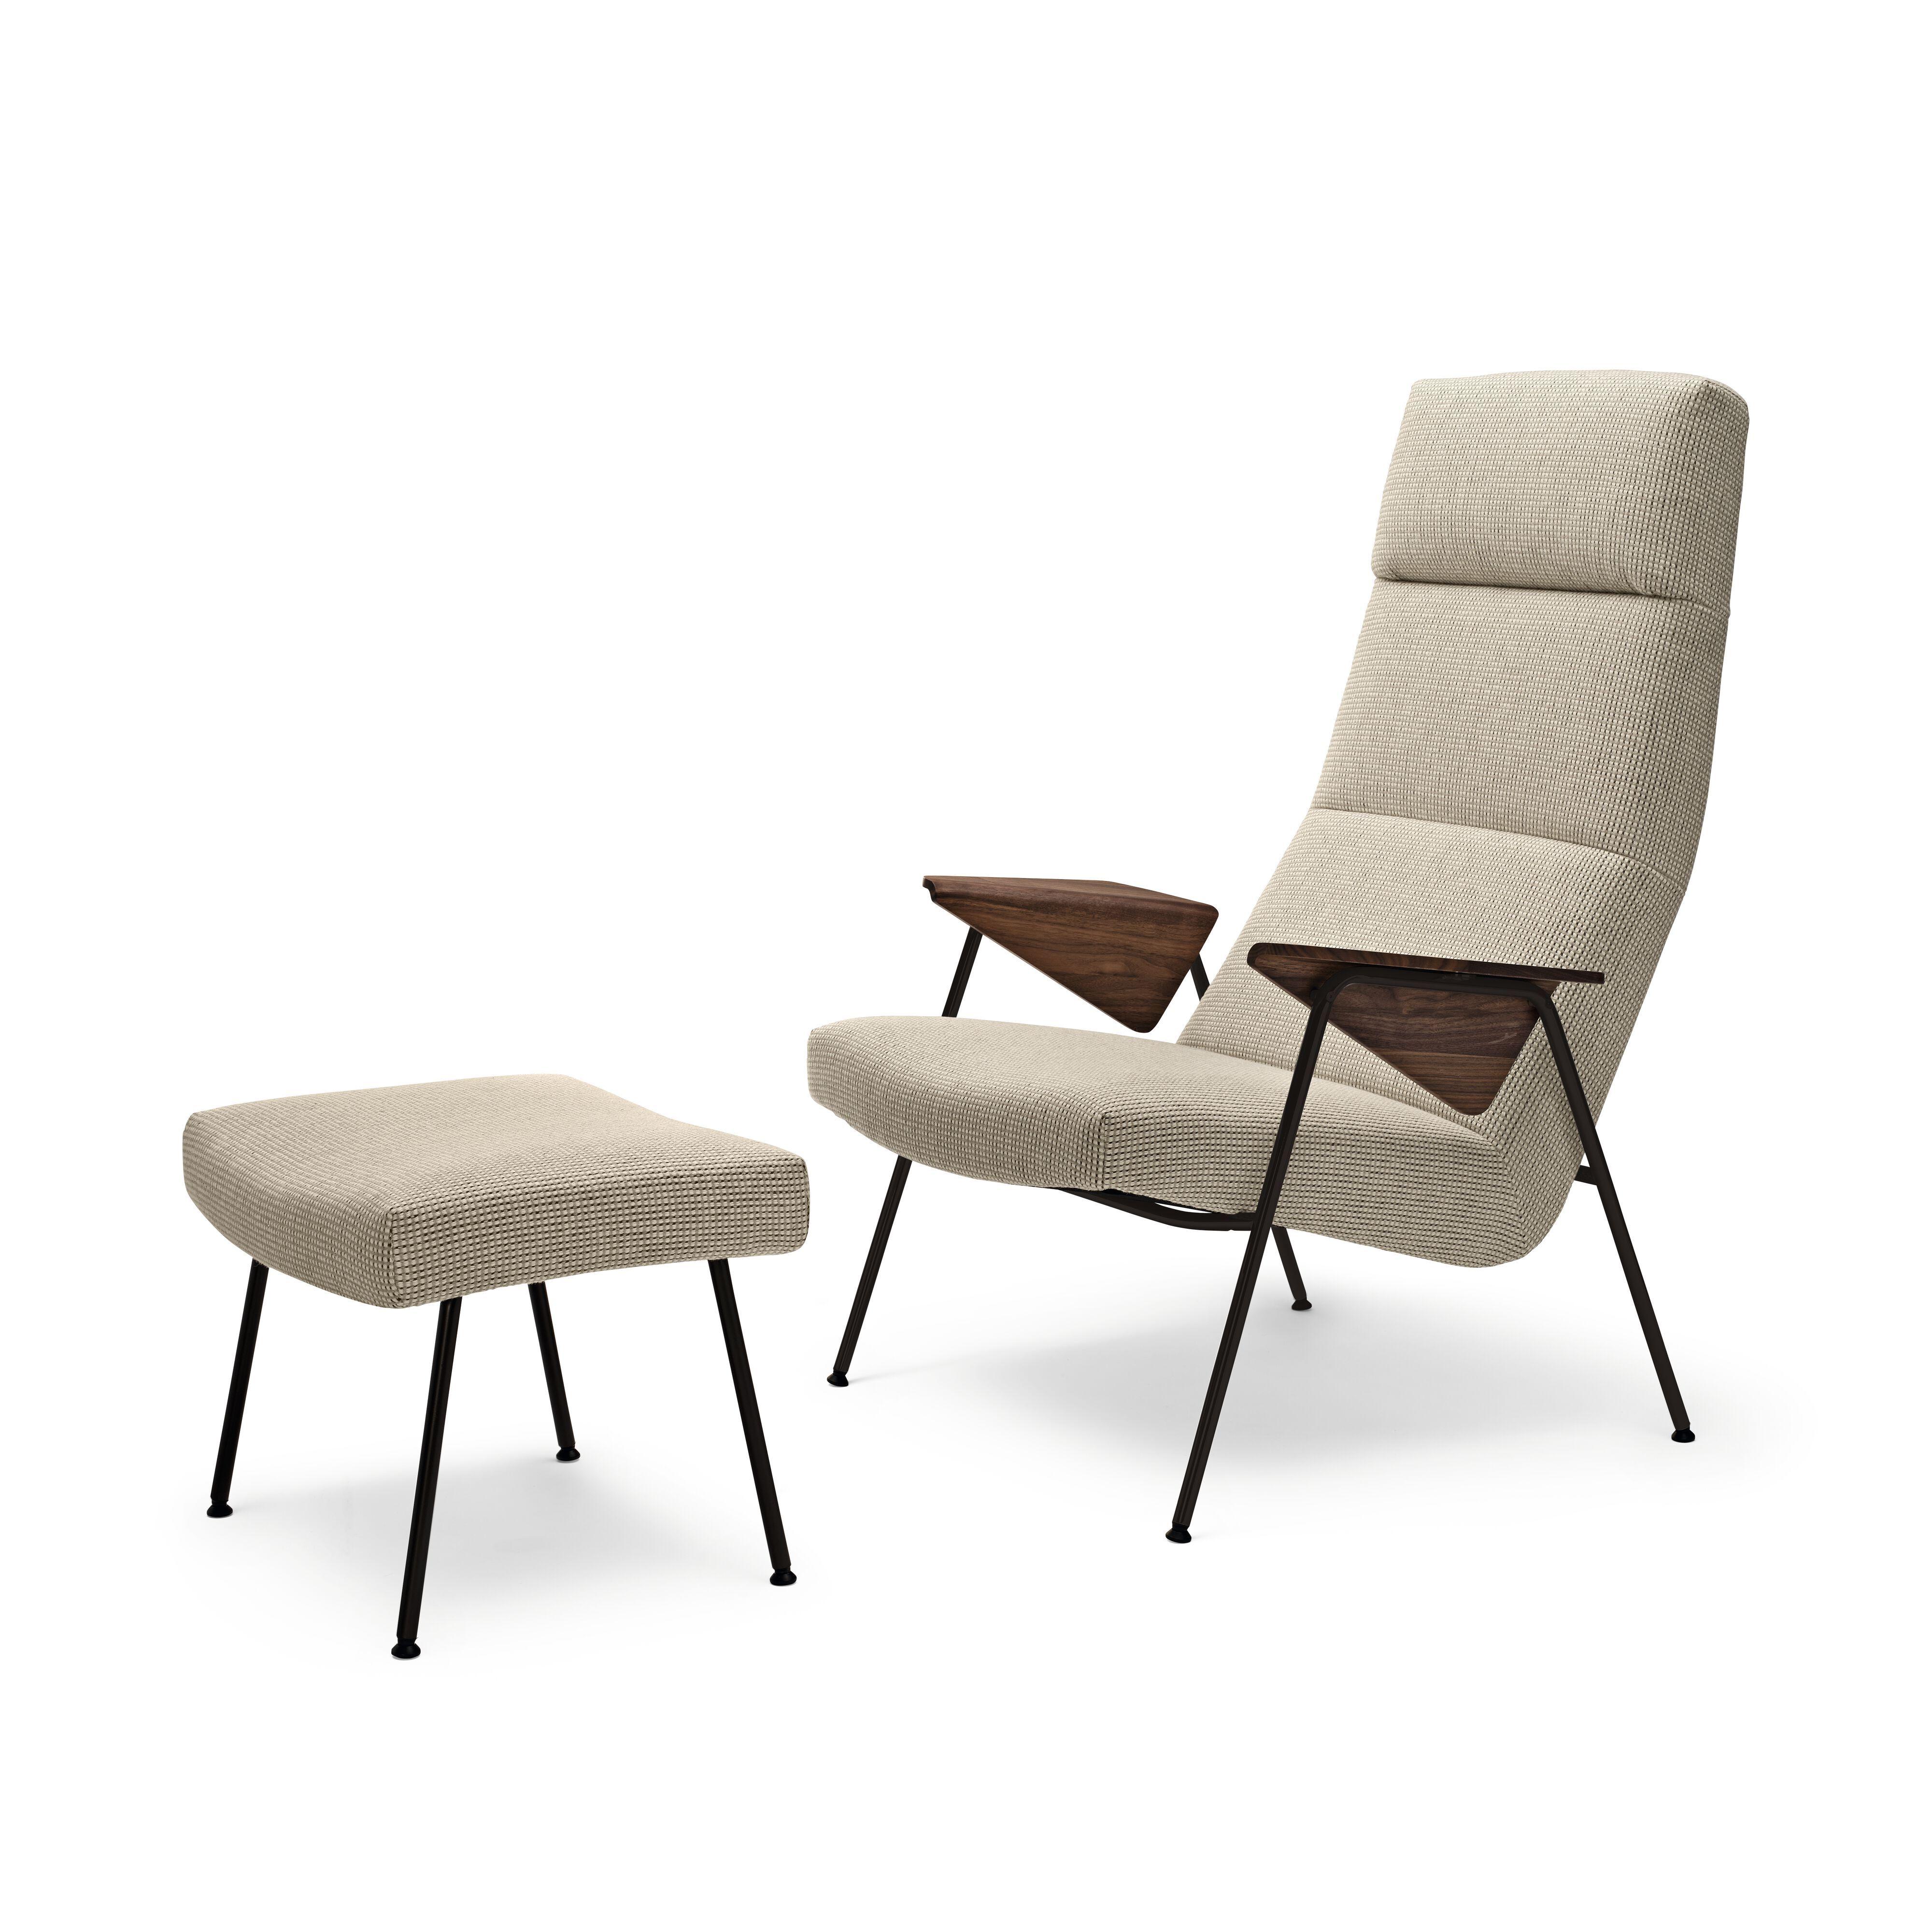 04-WK-Classic_Edition-Votteler_Chair-0021-H.tif